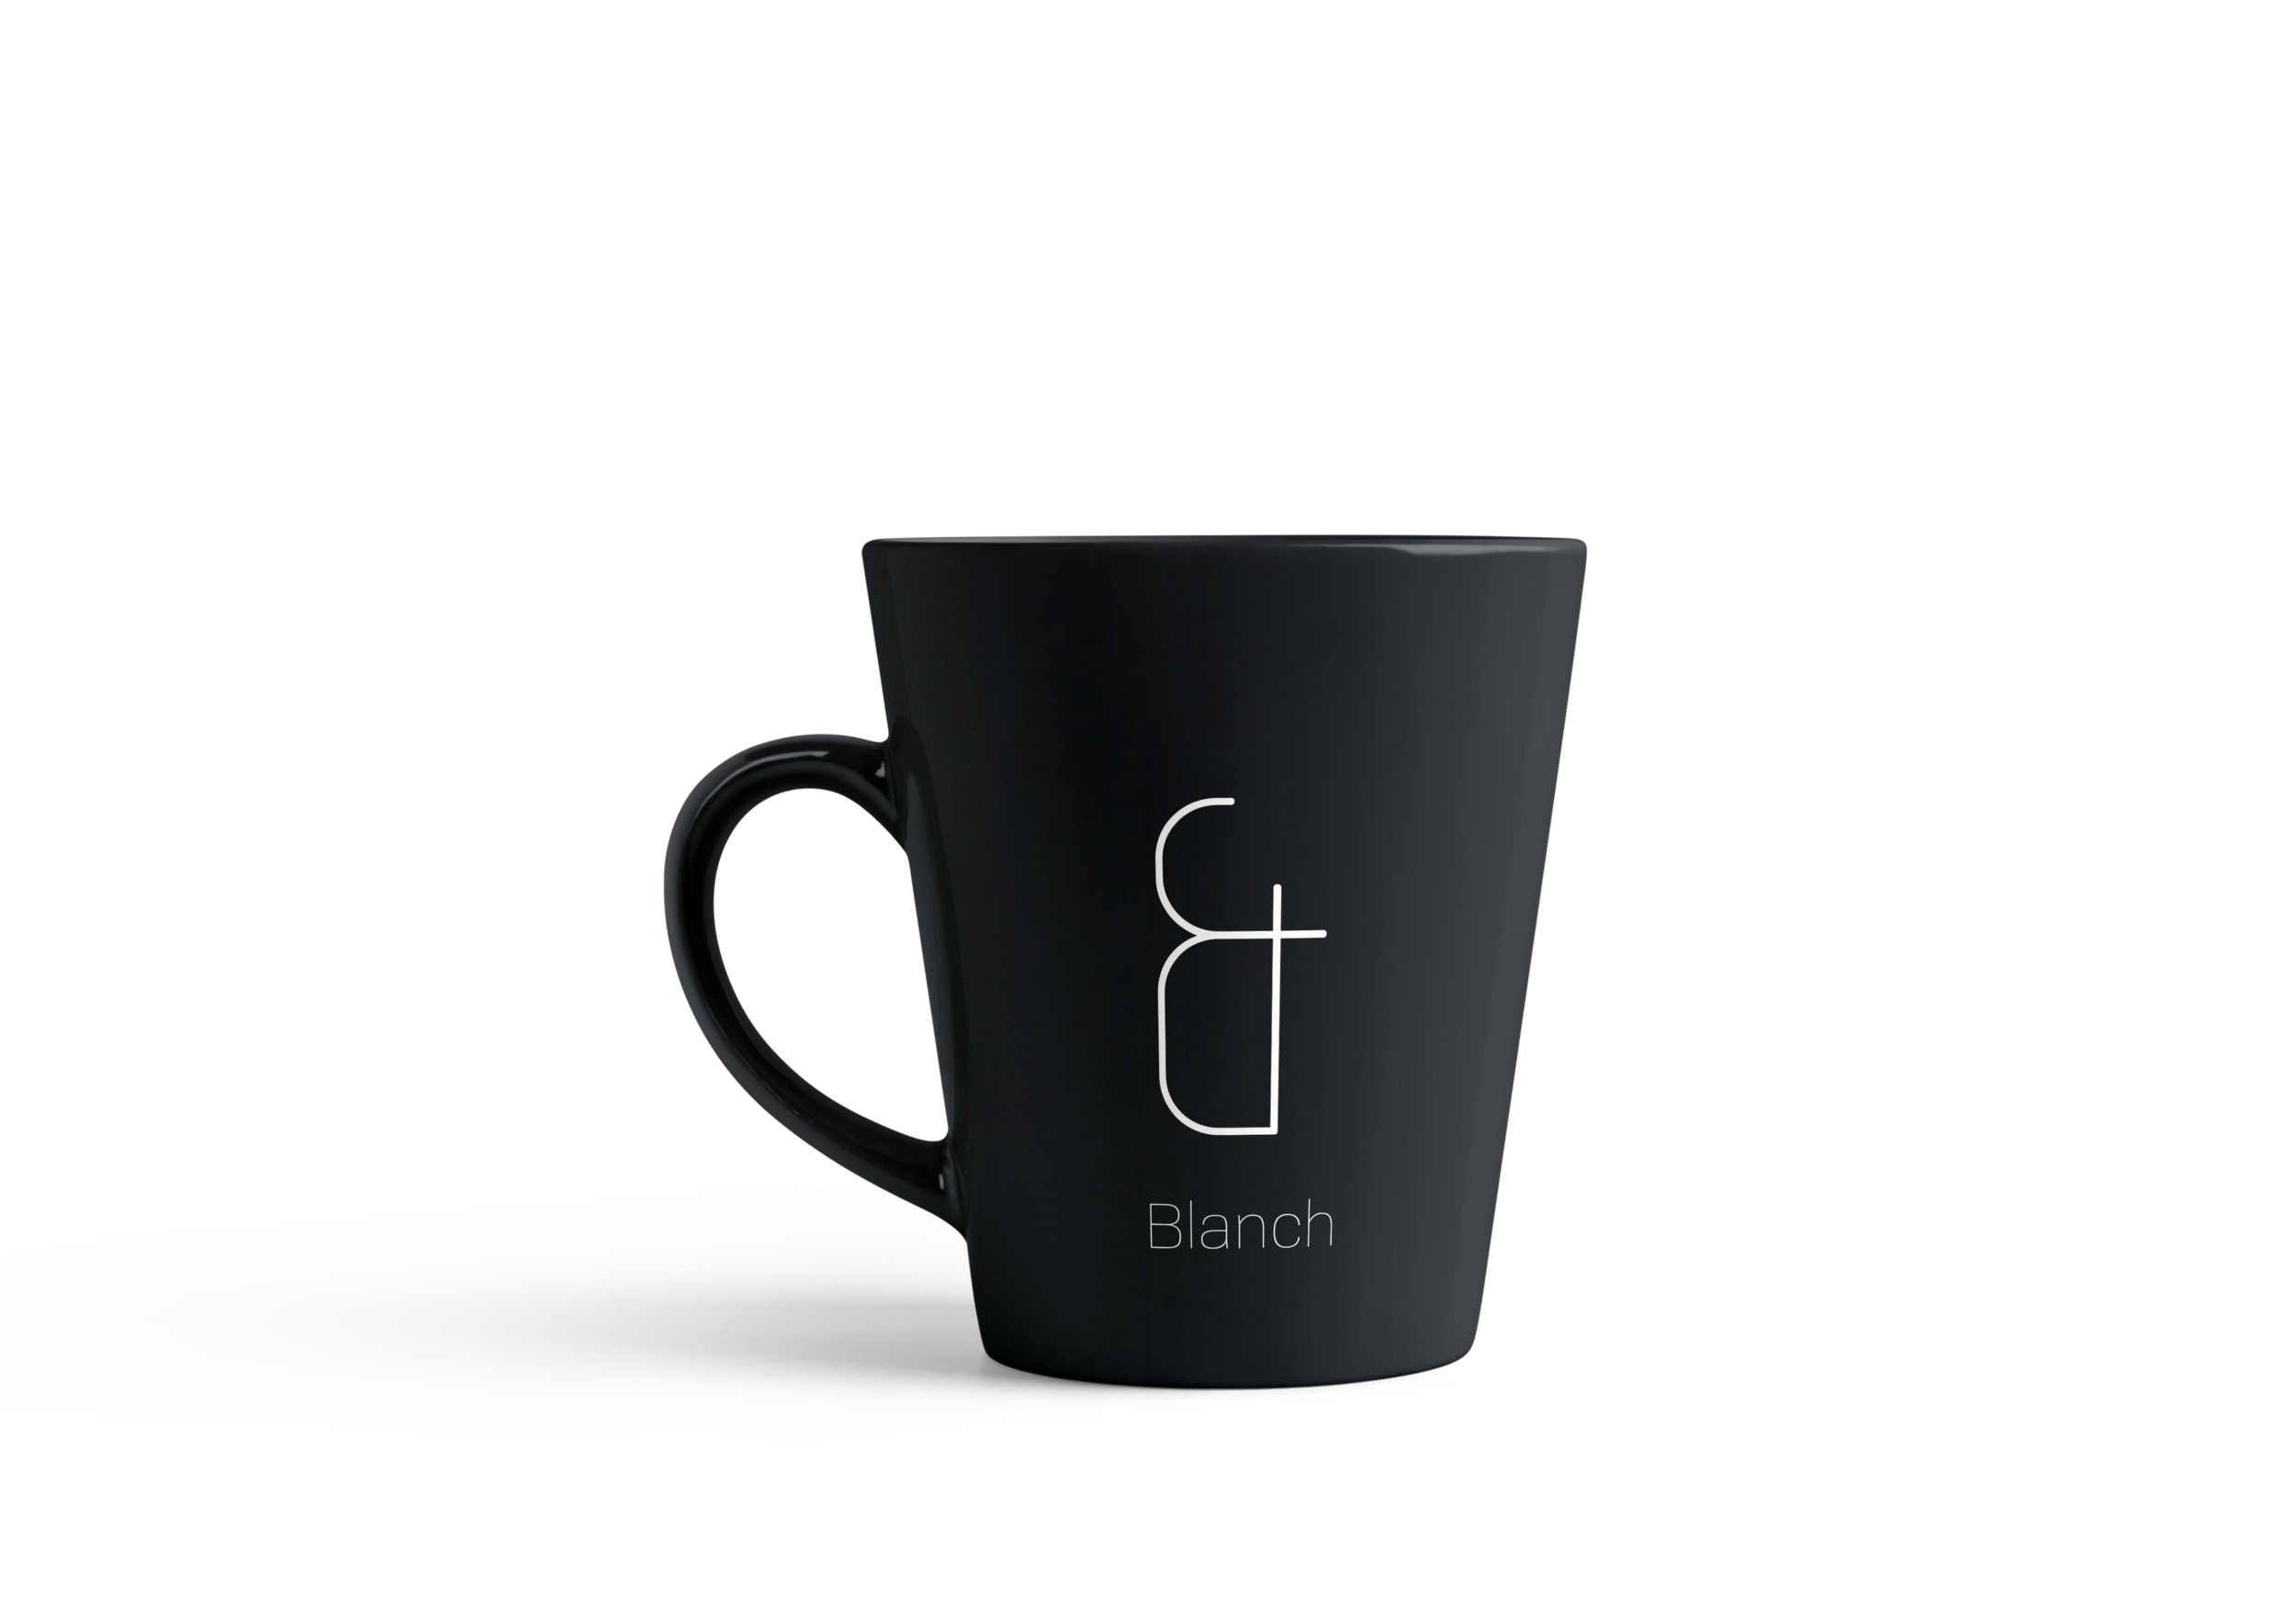 blanch ampersand mug.png